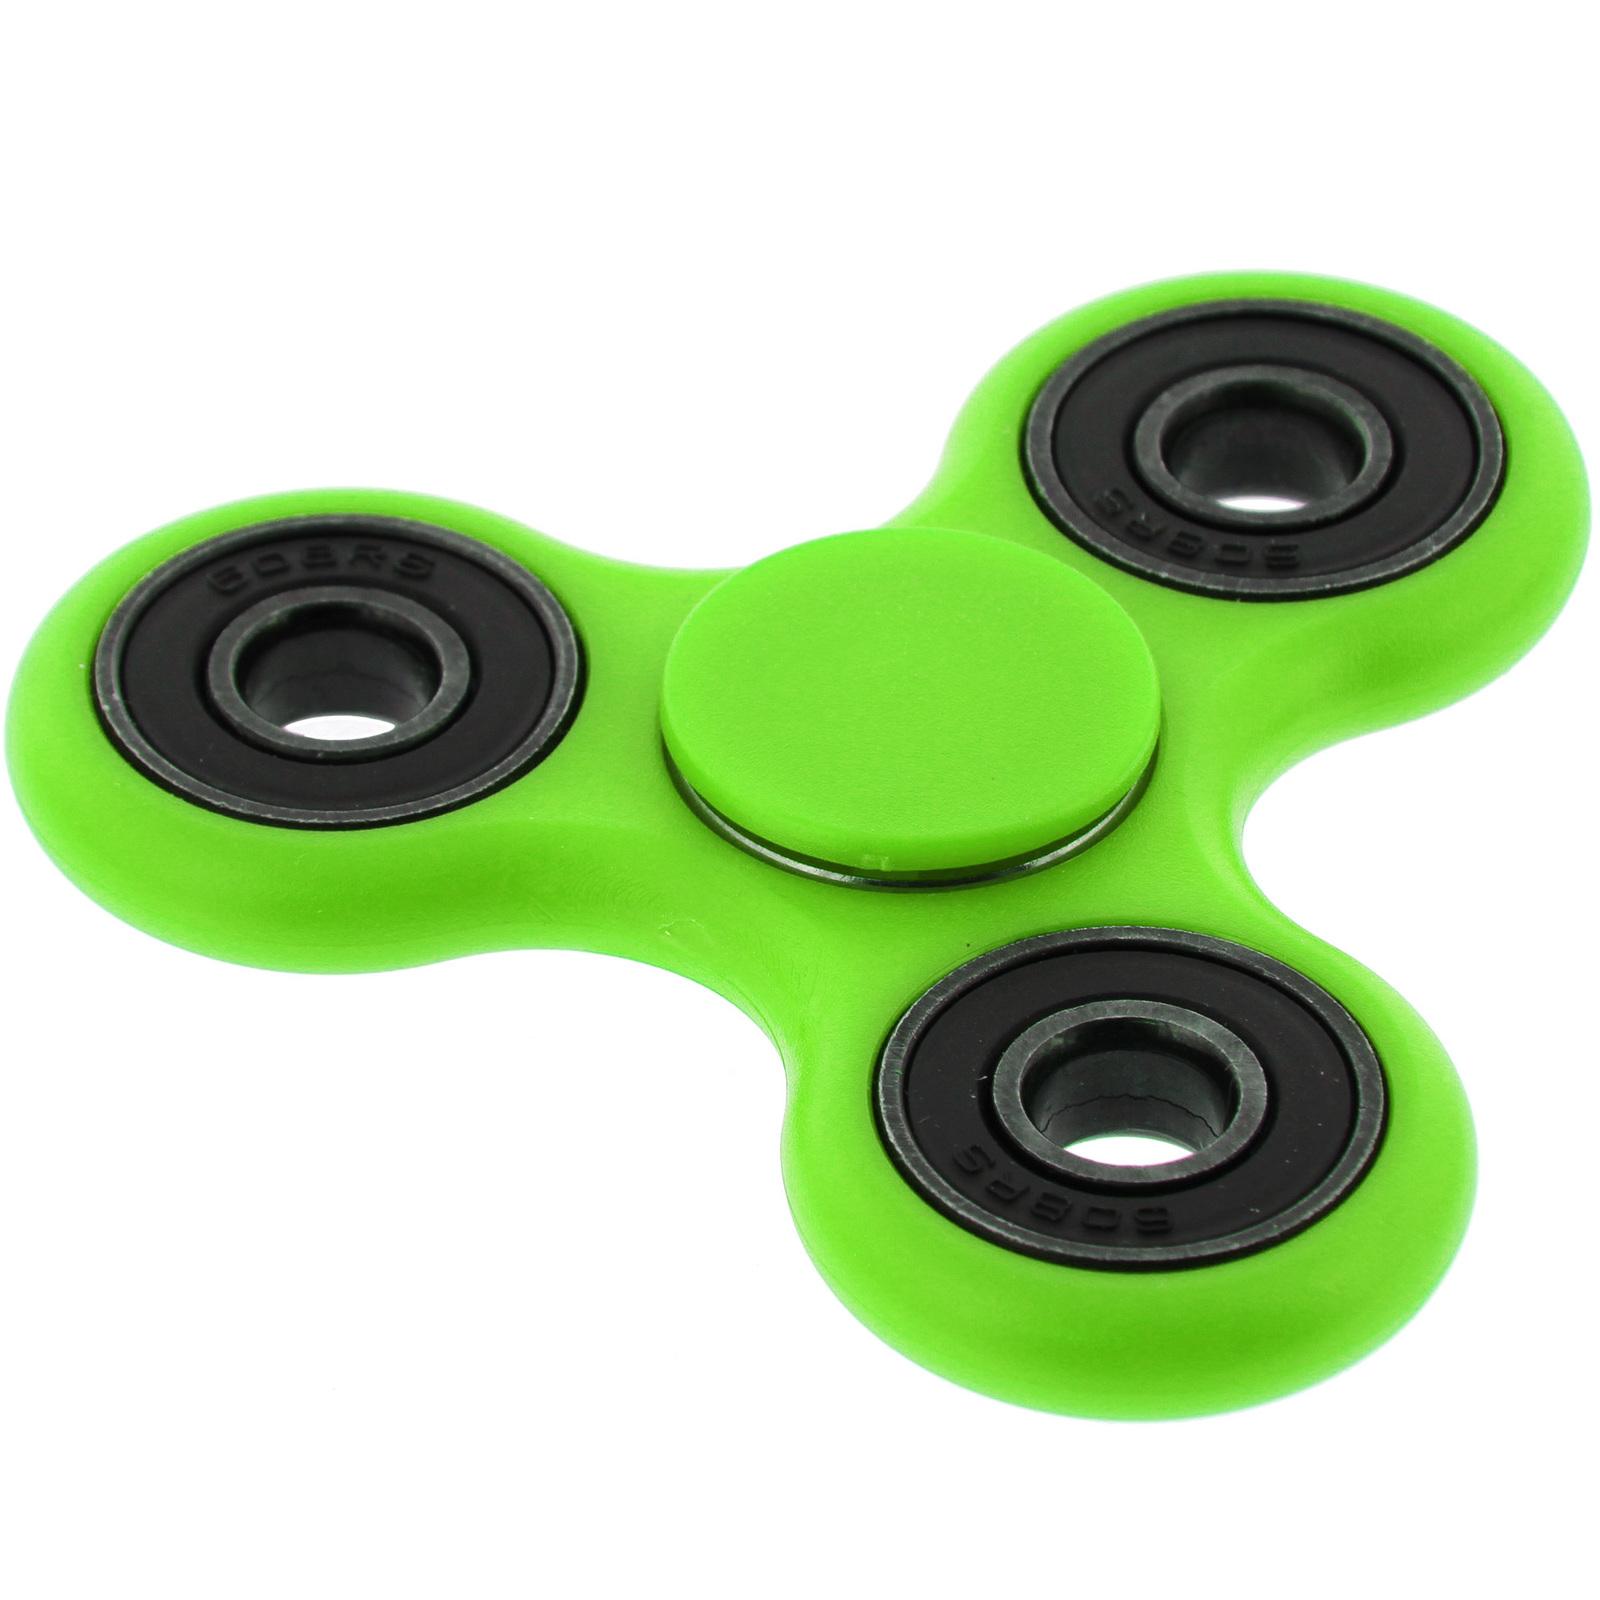 Fidget Spinner Buy: Buy Fidget Spinner (Green) At Mighty Ape Australia